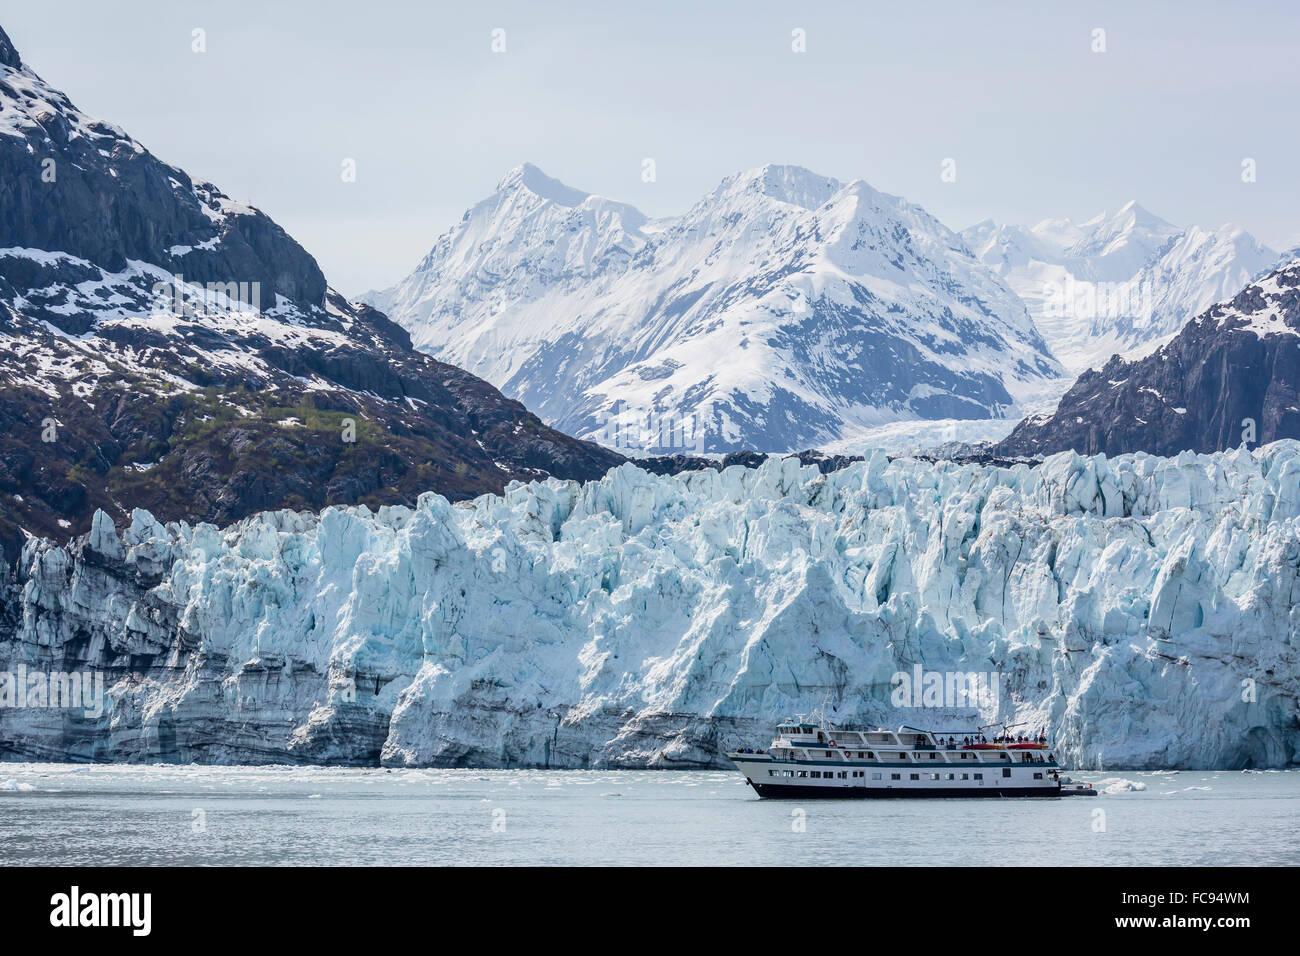 A tourist ship explores the Lamplugh Glacier in Glacier Bay National Park and Preserve, southeast Alaska, USA - Stock Image